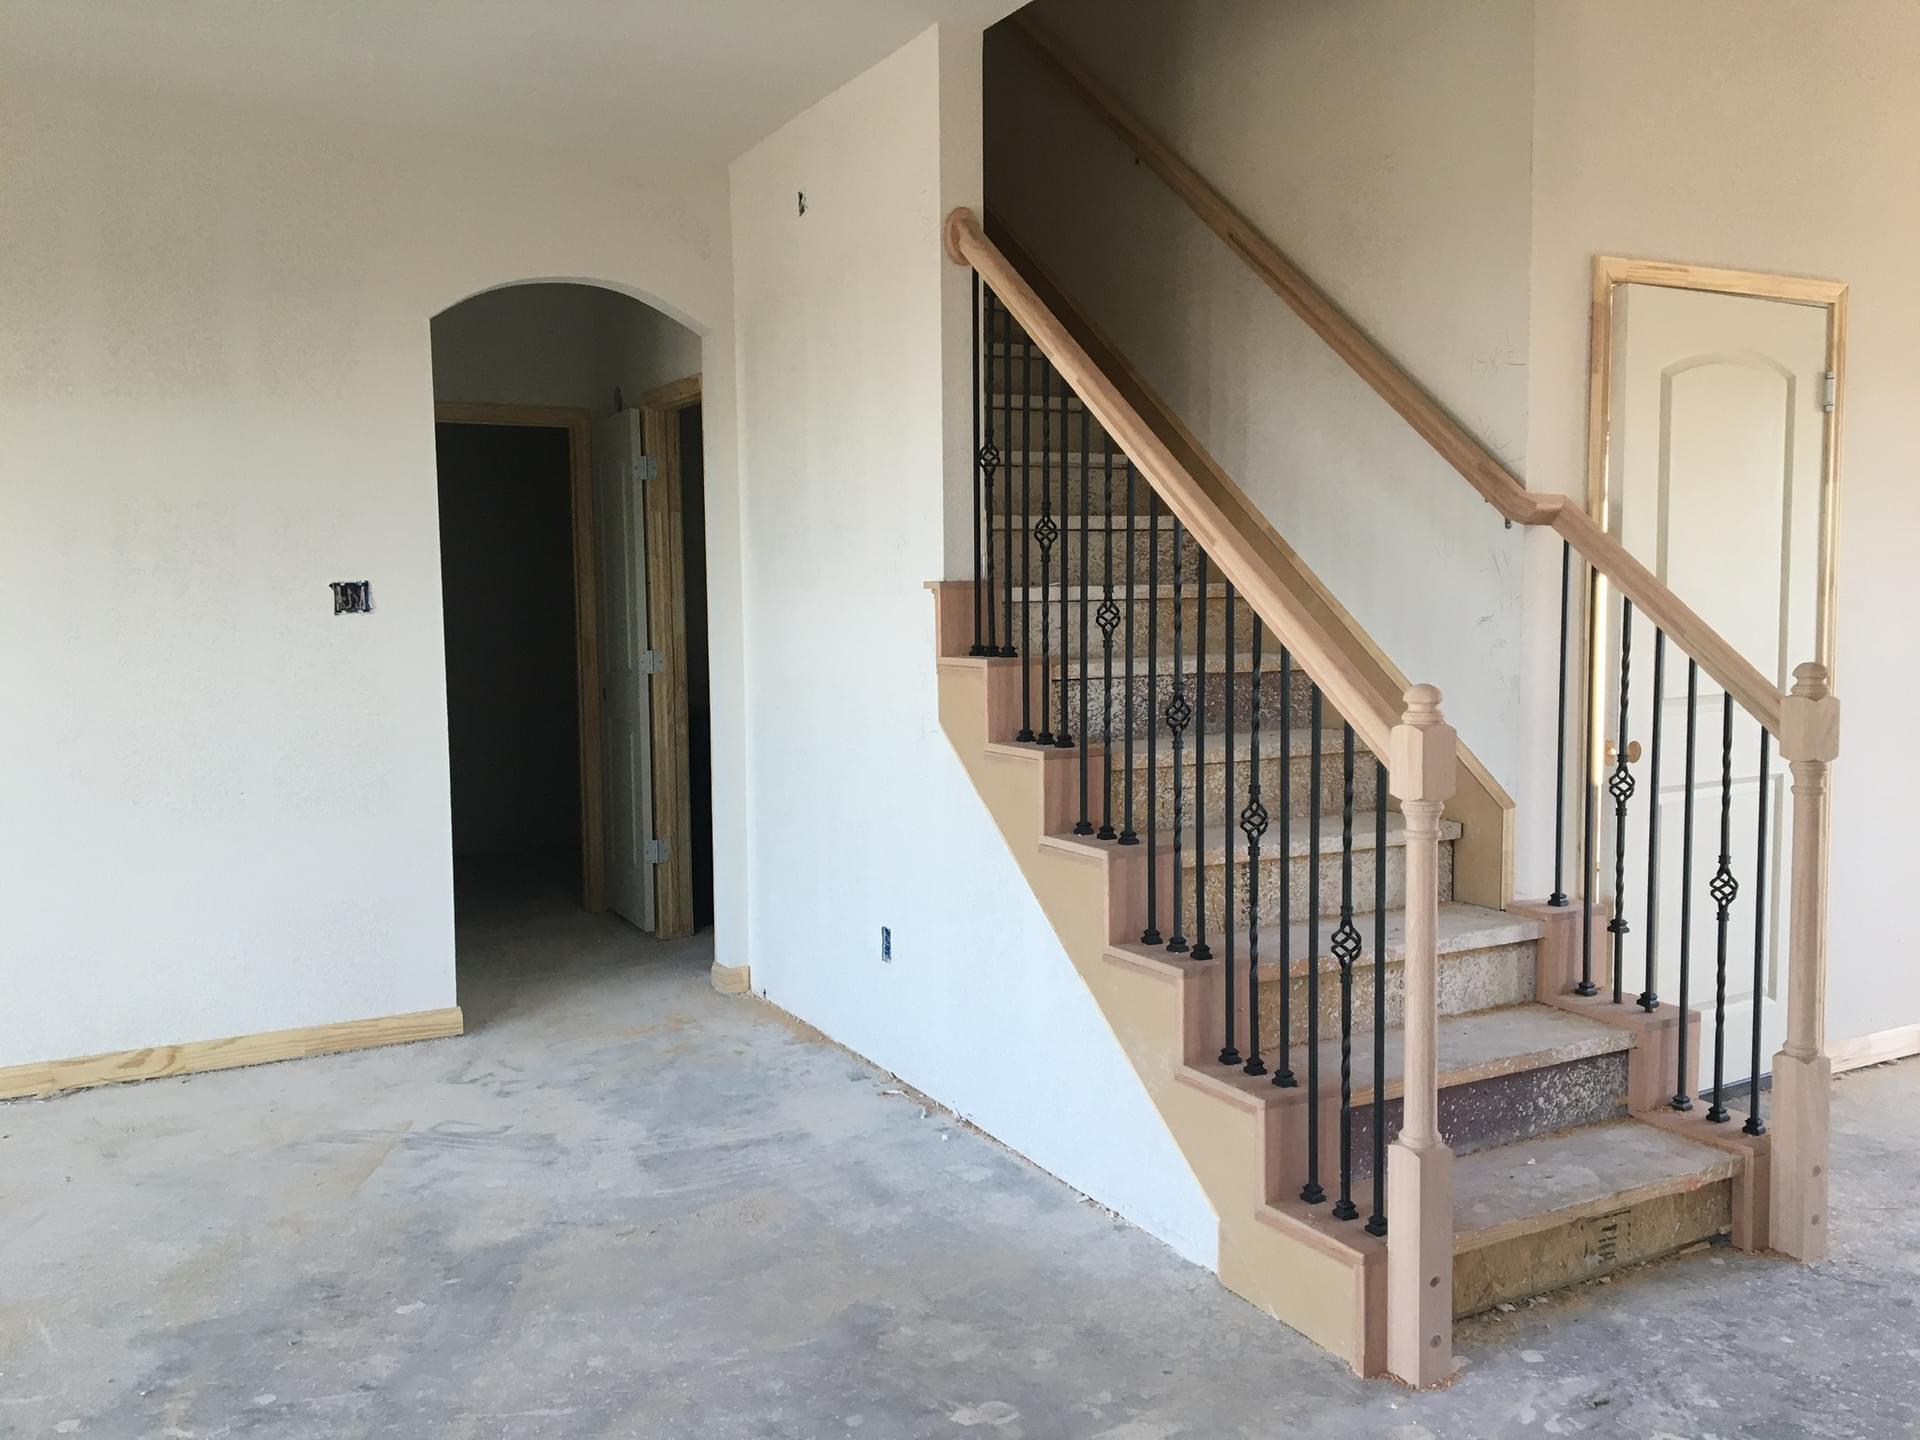 3,328sf New Home in Killeen, TX